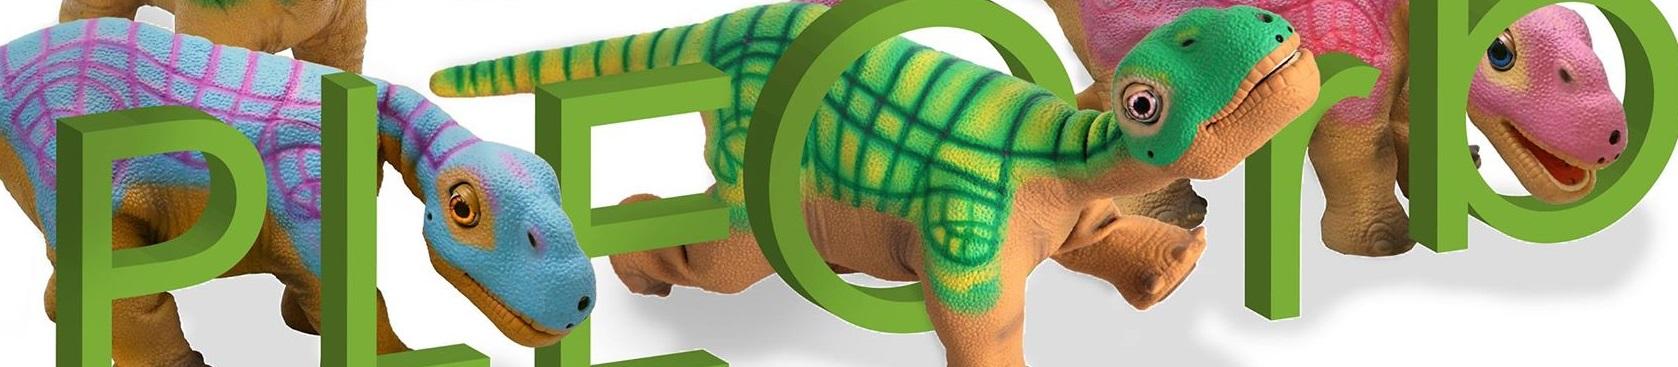 Pleo rb Twin Pack